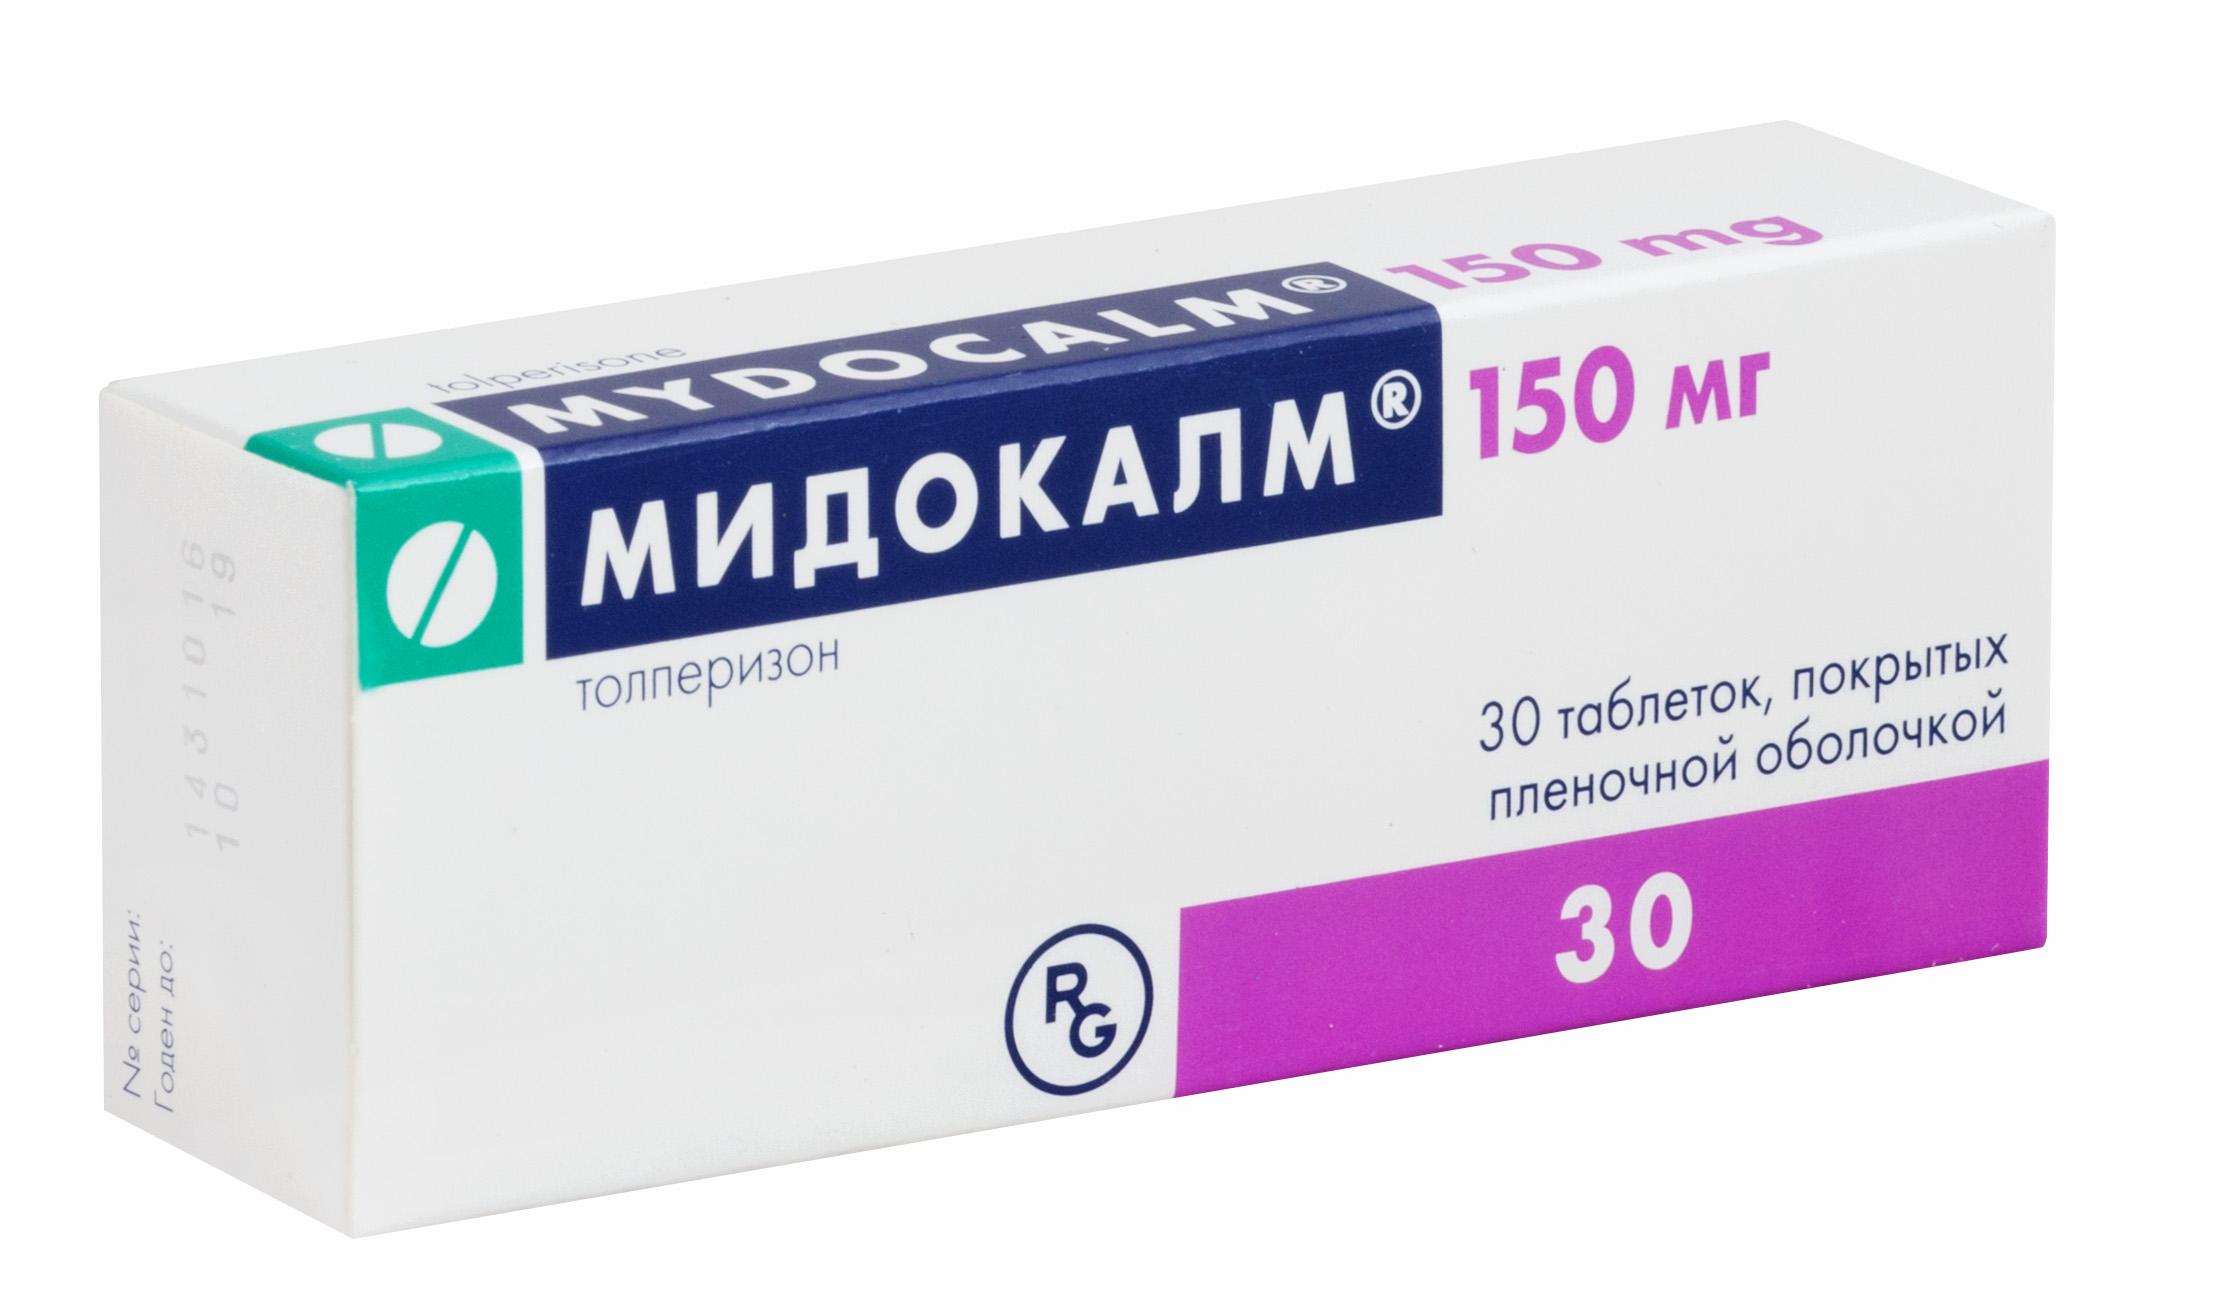 Мидокалм таб. п.п.о. 150мг n30